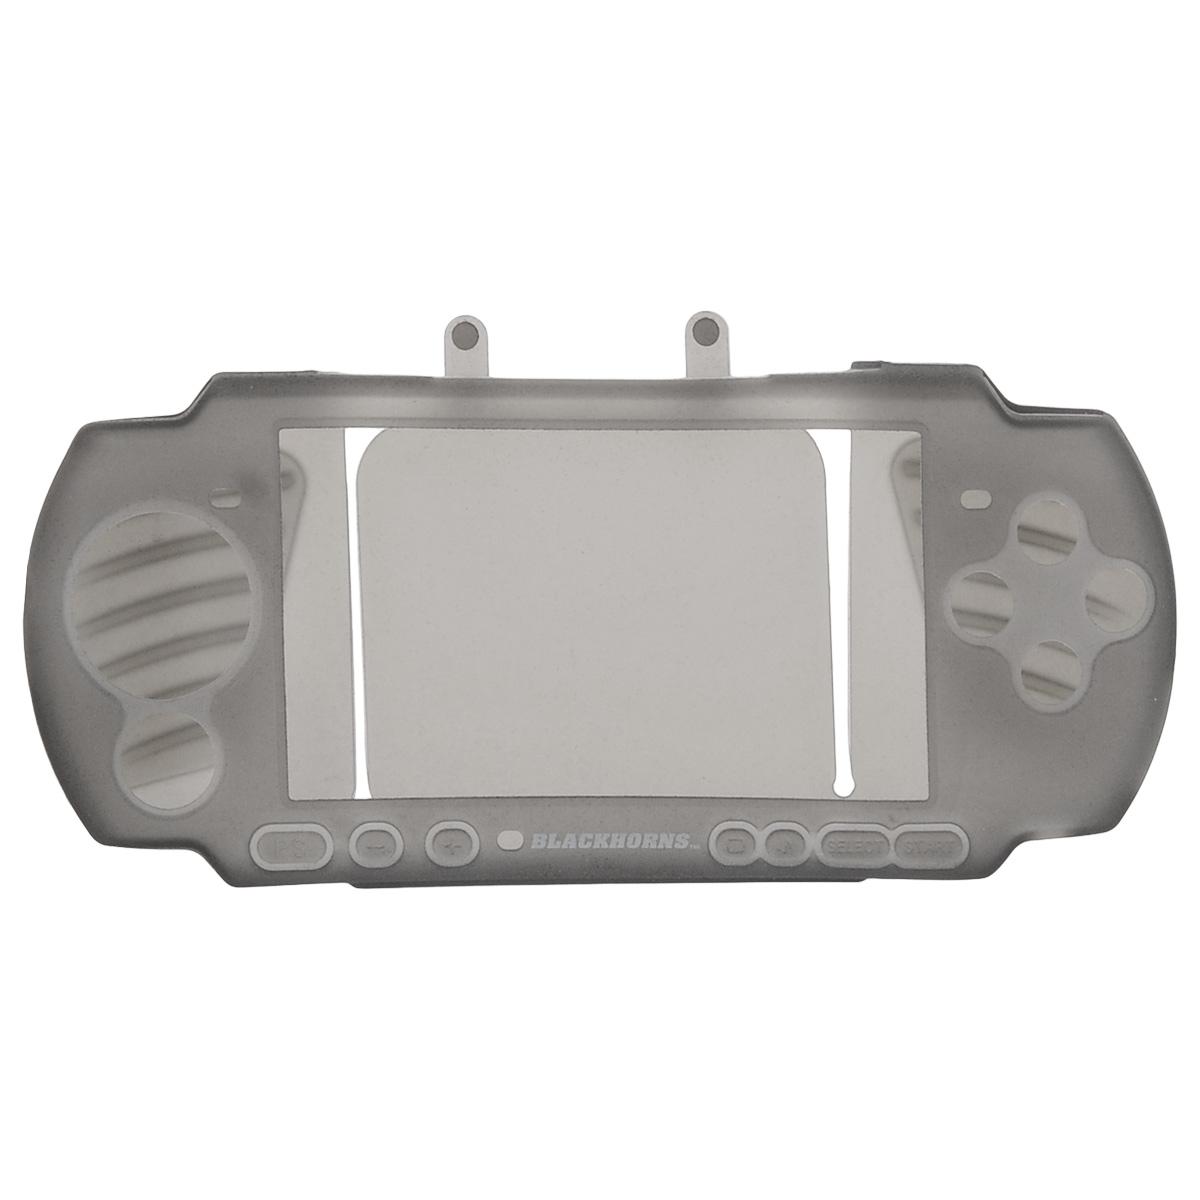 Black Horns Kit 3 in 1 набор аксессуаров для Sony PSP 3000, Gray